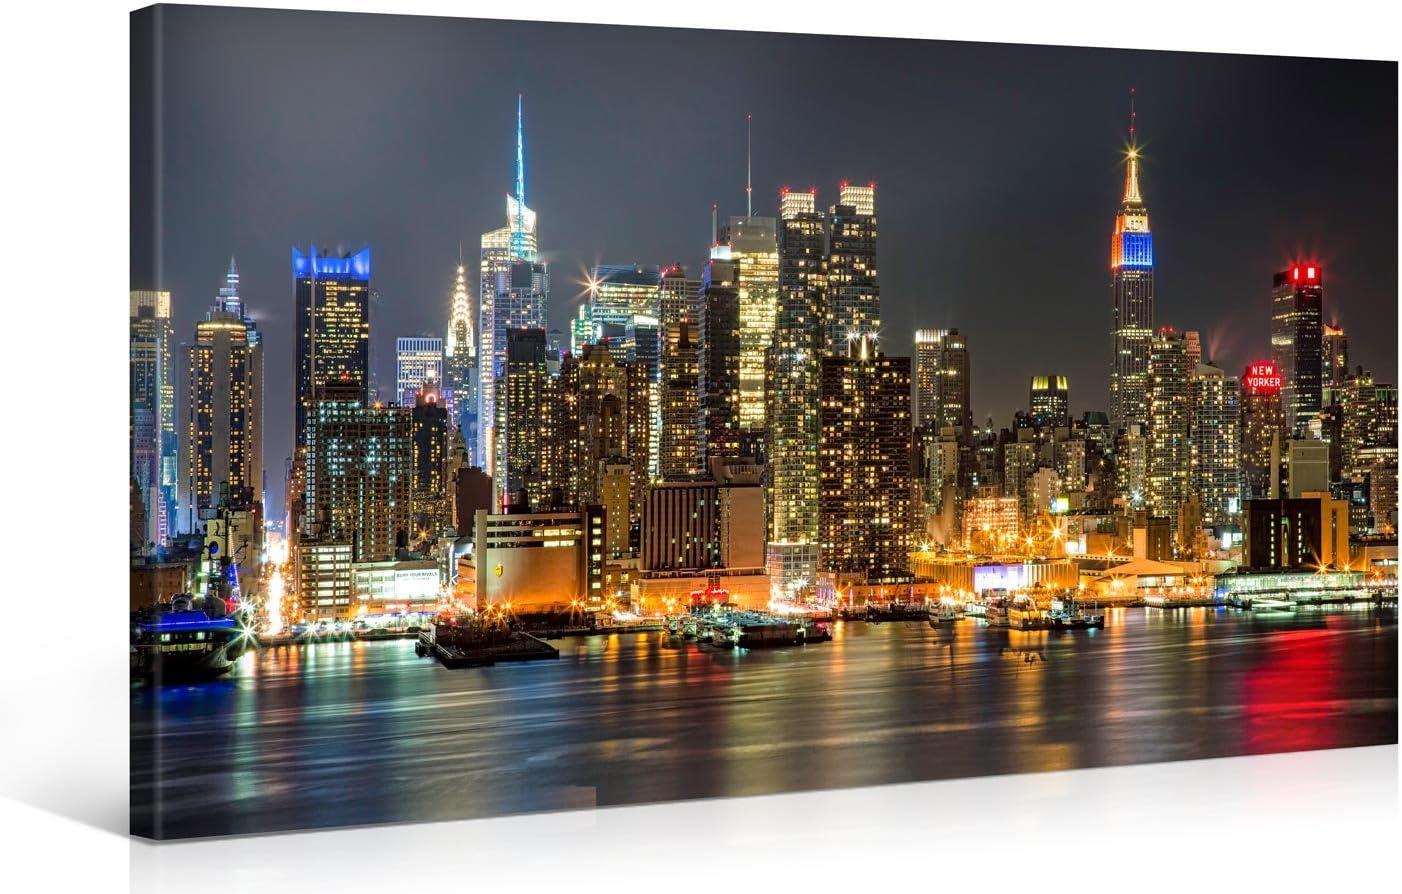 Gallery of Innovative Art - ILLUMINATED MANHATTAN NEW YORK 100x50cm #e4348 - Impresión Giclee en lienzo, foto lienzo Wall Art- Fotos en lienzo montadas sobre bastidor – Im?genes en lienzo XXL en alta